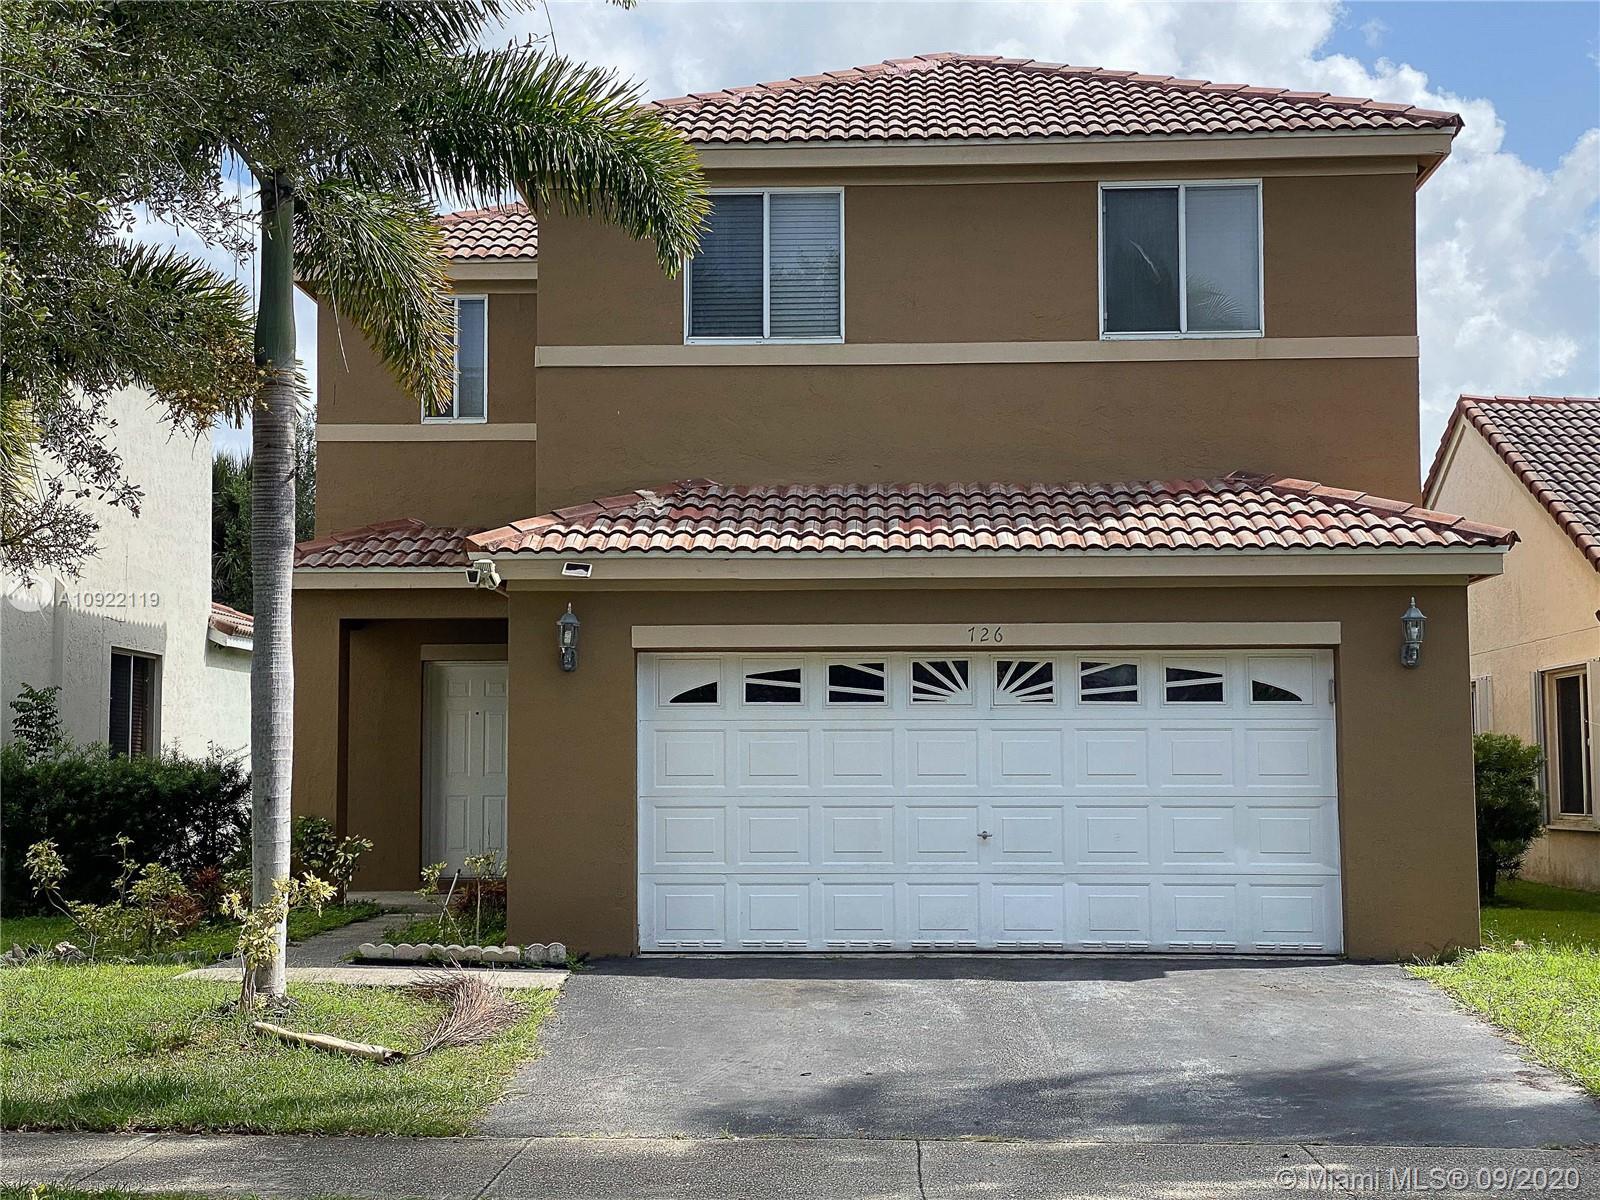 726  San Remo Dr  For Sale A10922119, FL